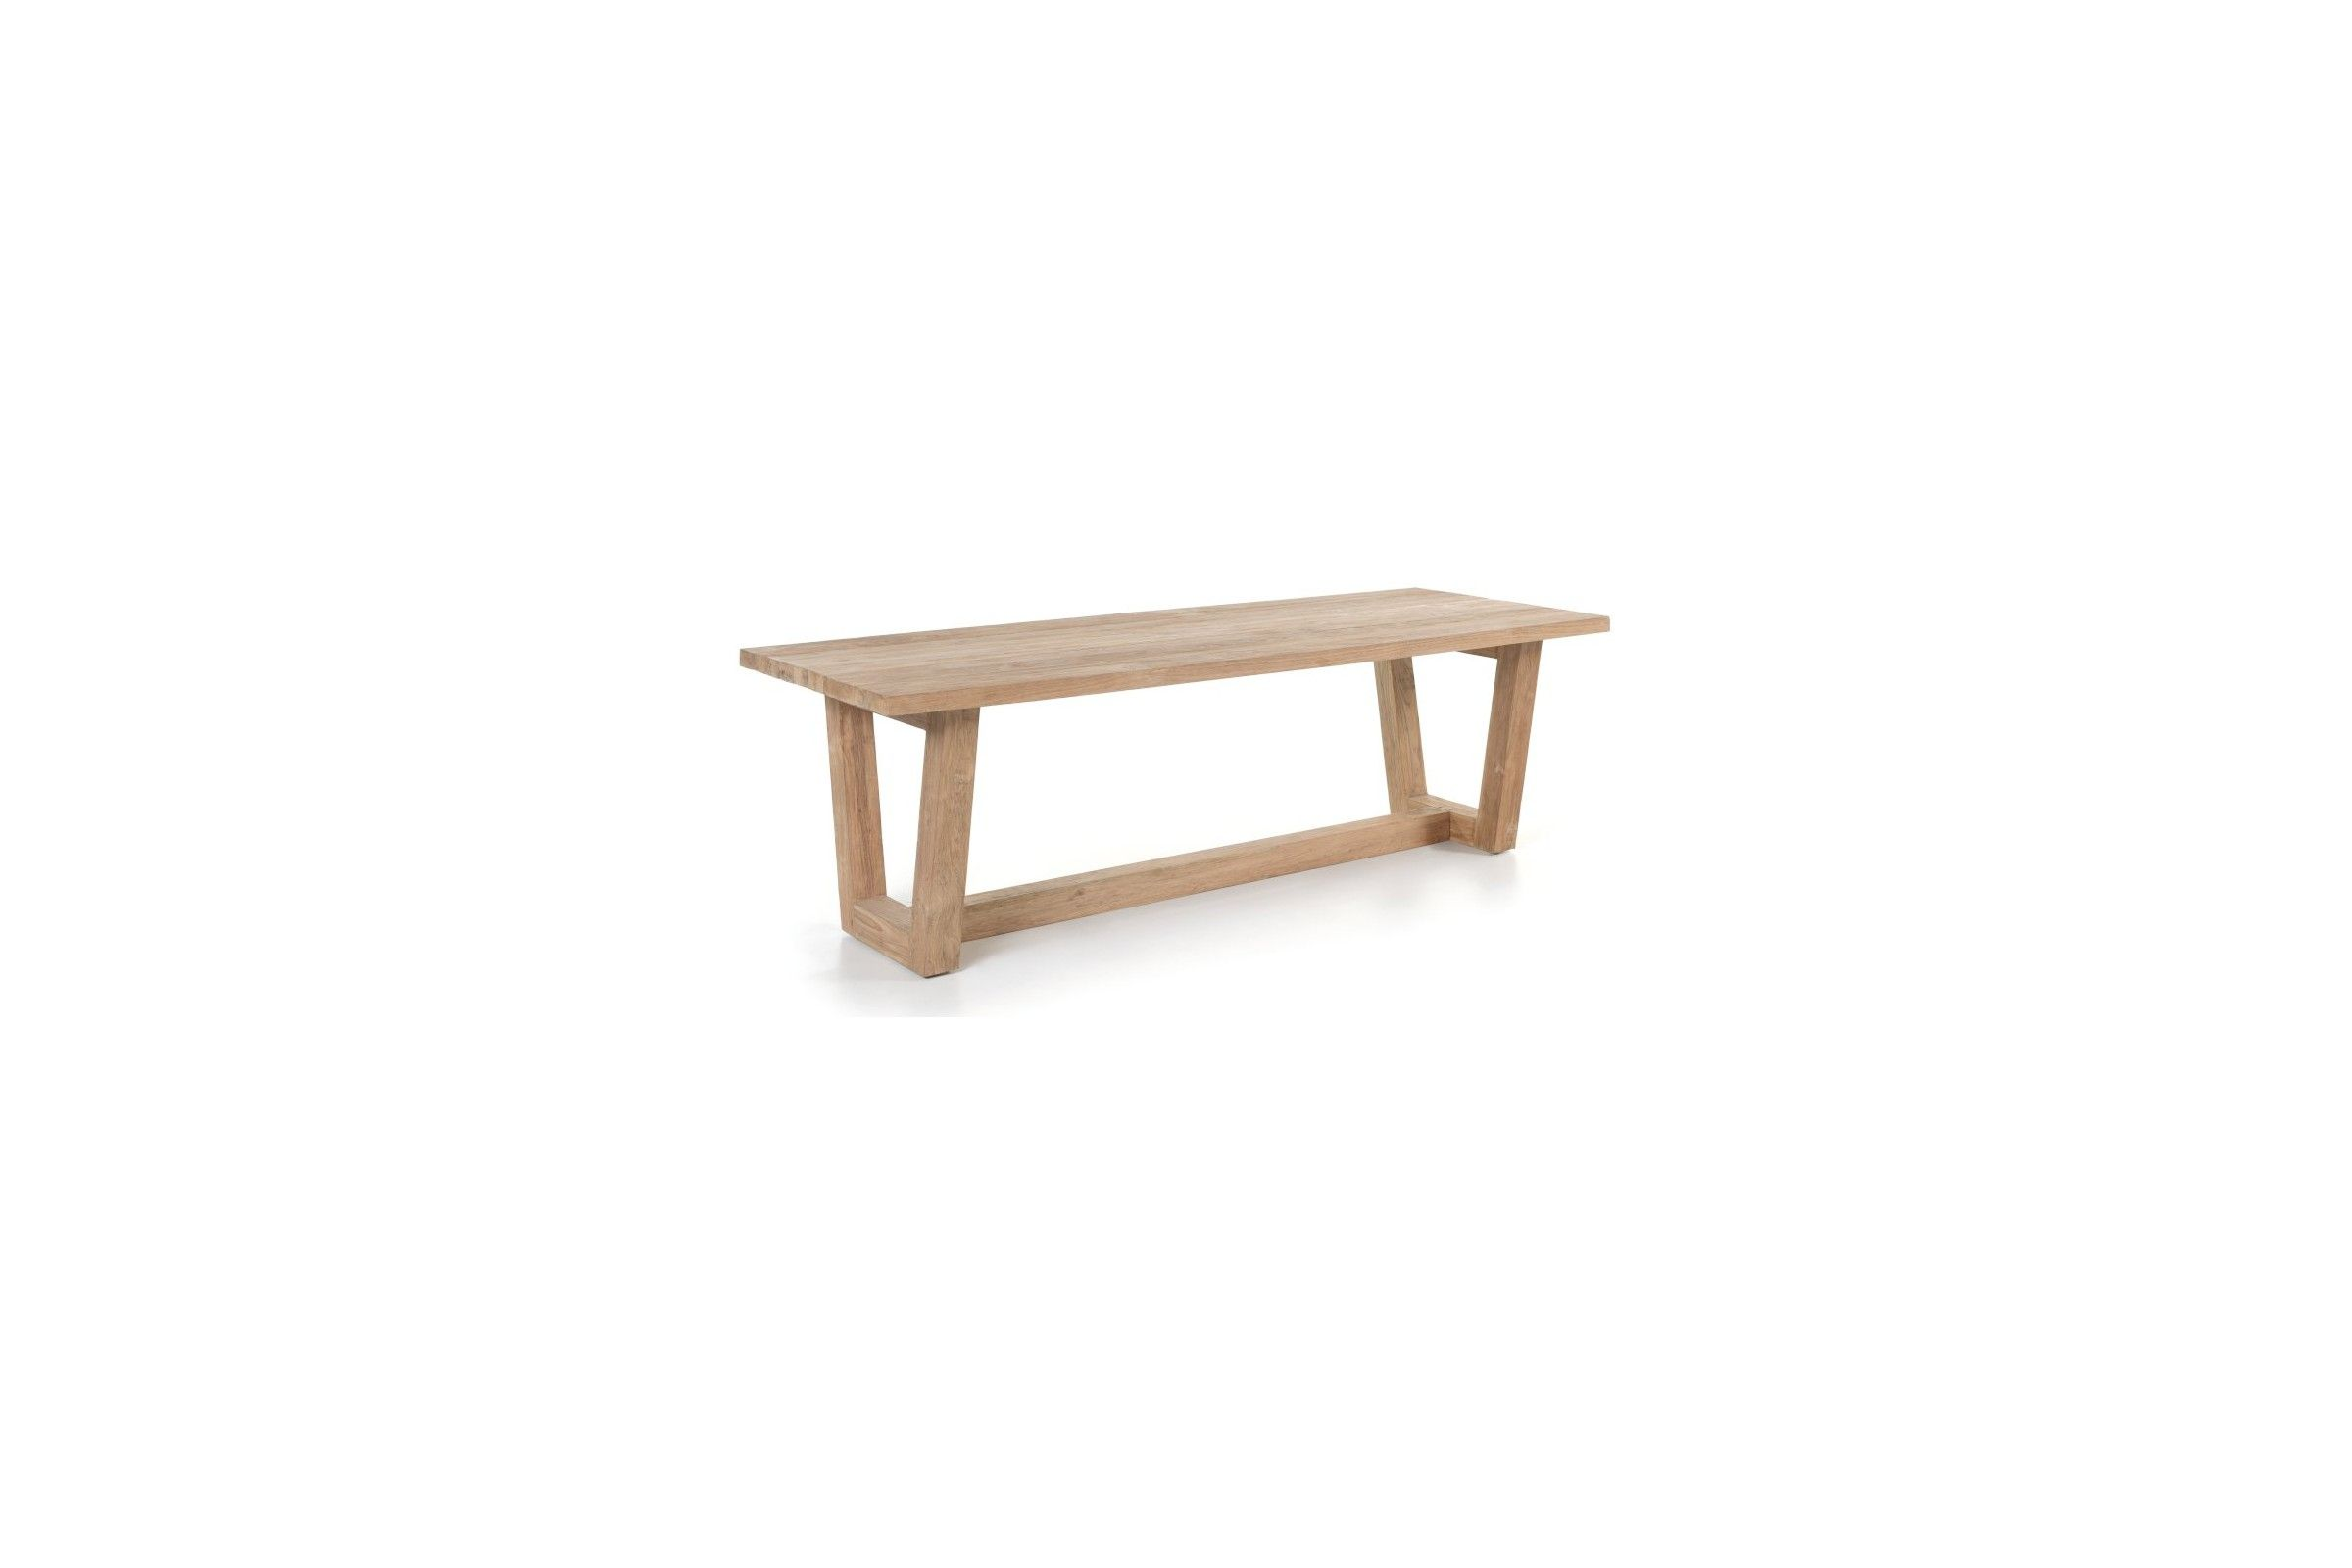 table en vieux teck massif 250 cm dundee la galerie du teck. Black Bedroom Furniture Sets. Home Design Ideas